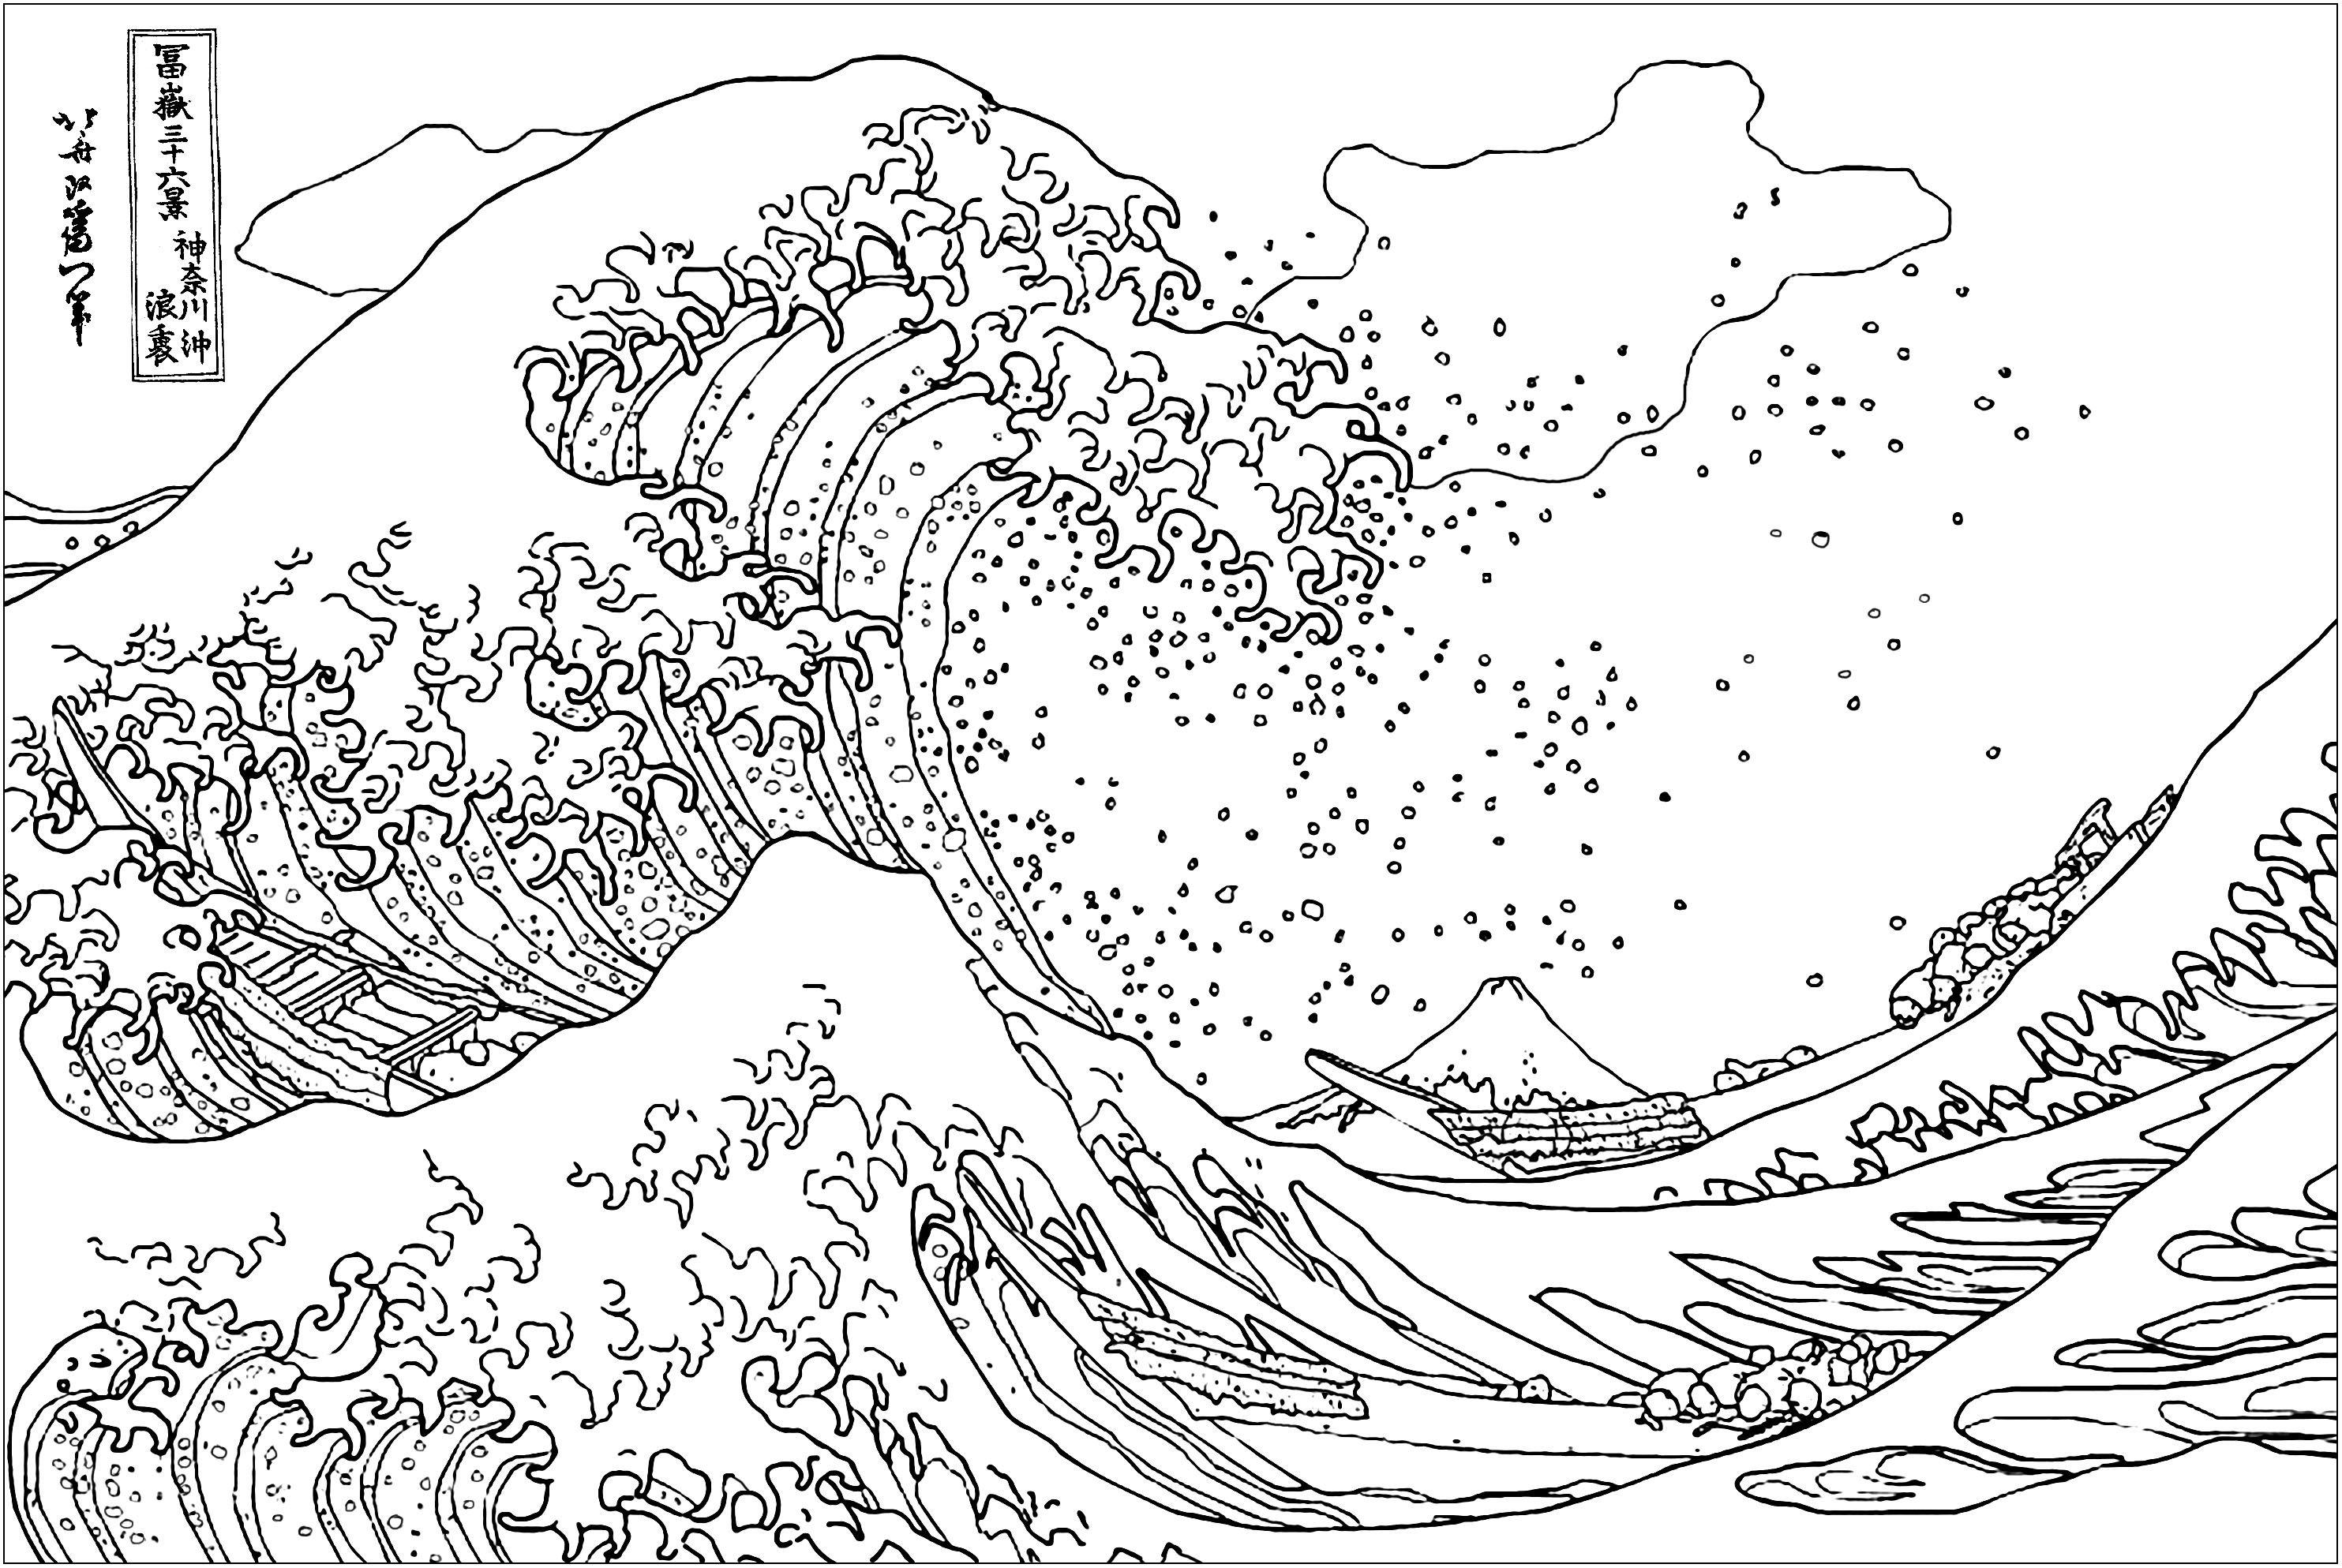 Hokusai The Great Wave Off Kanagawa